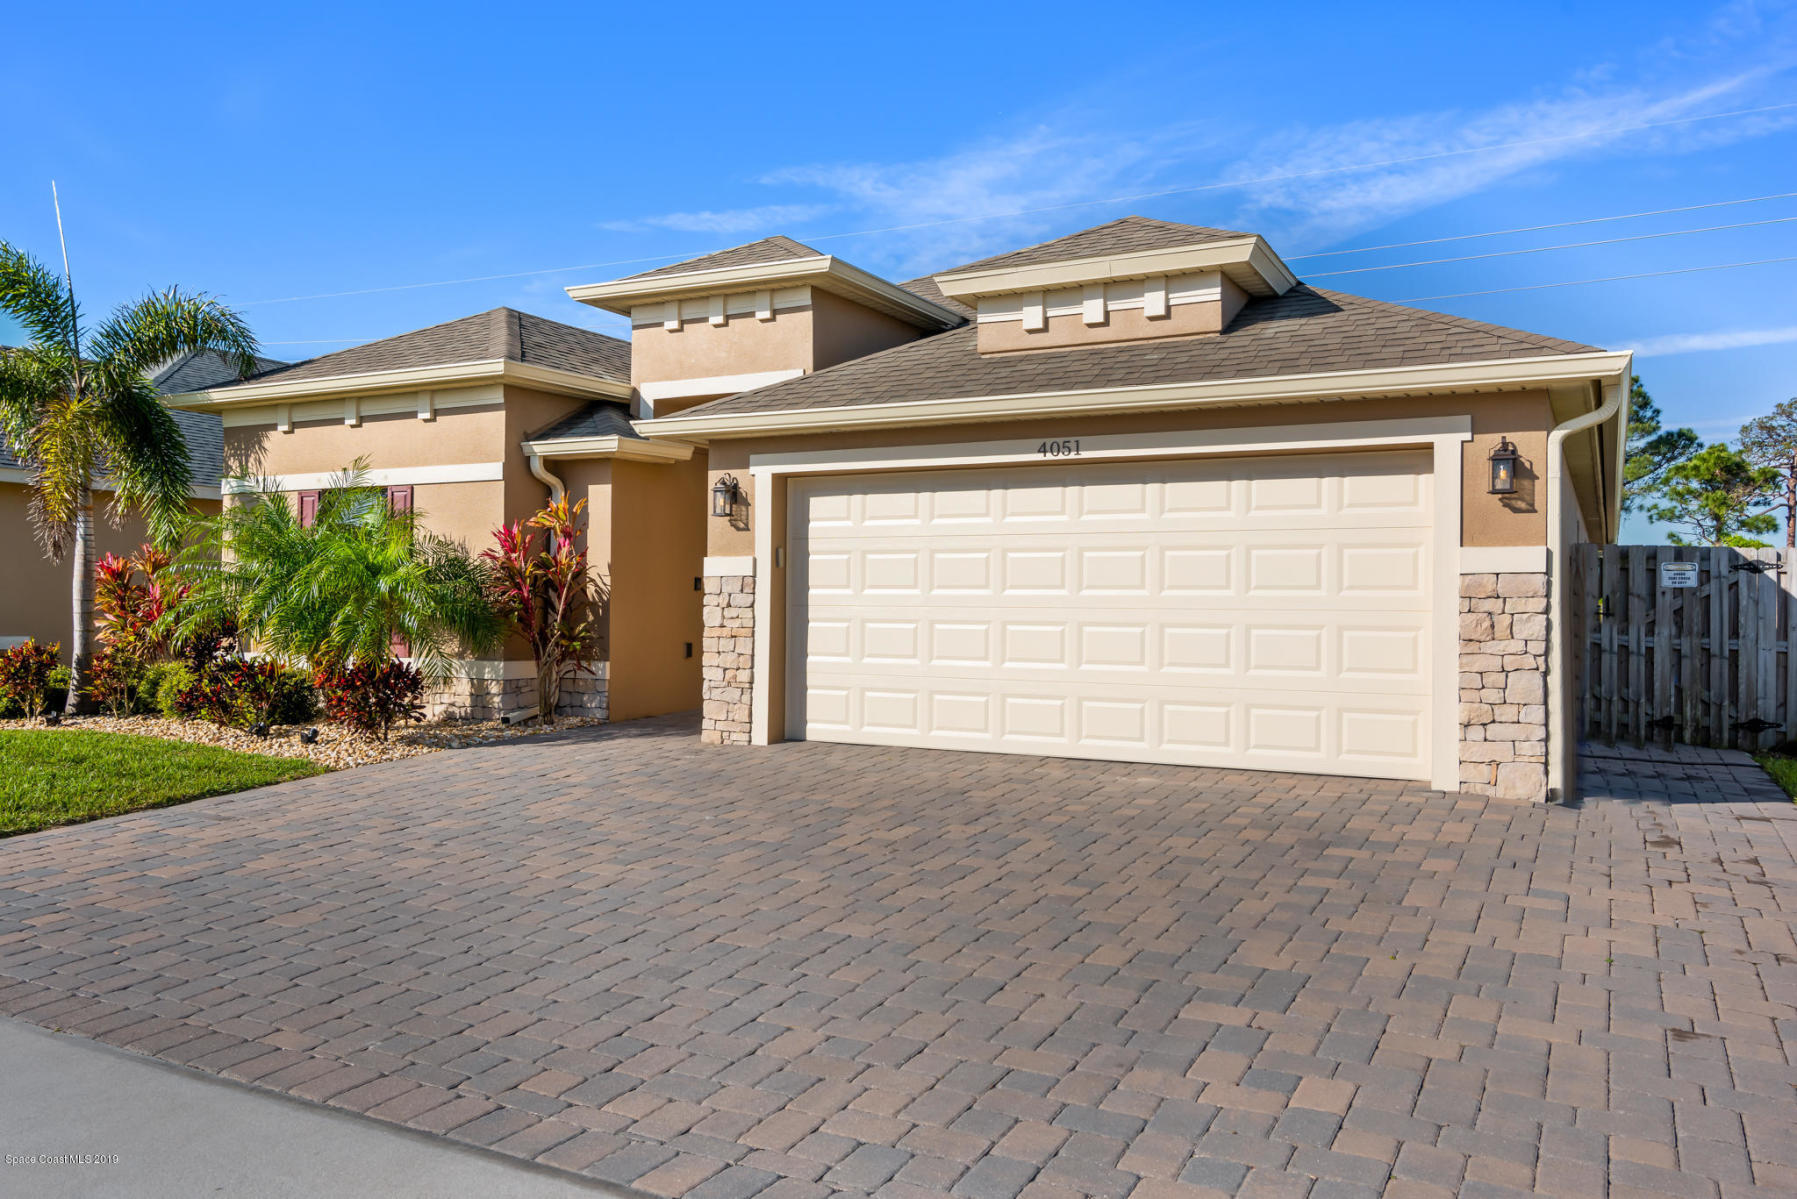 4051 Brantley Cir Rockledge, FL 32955. Sold by Brent Burns